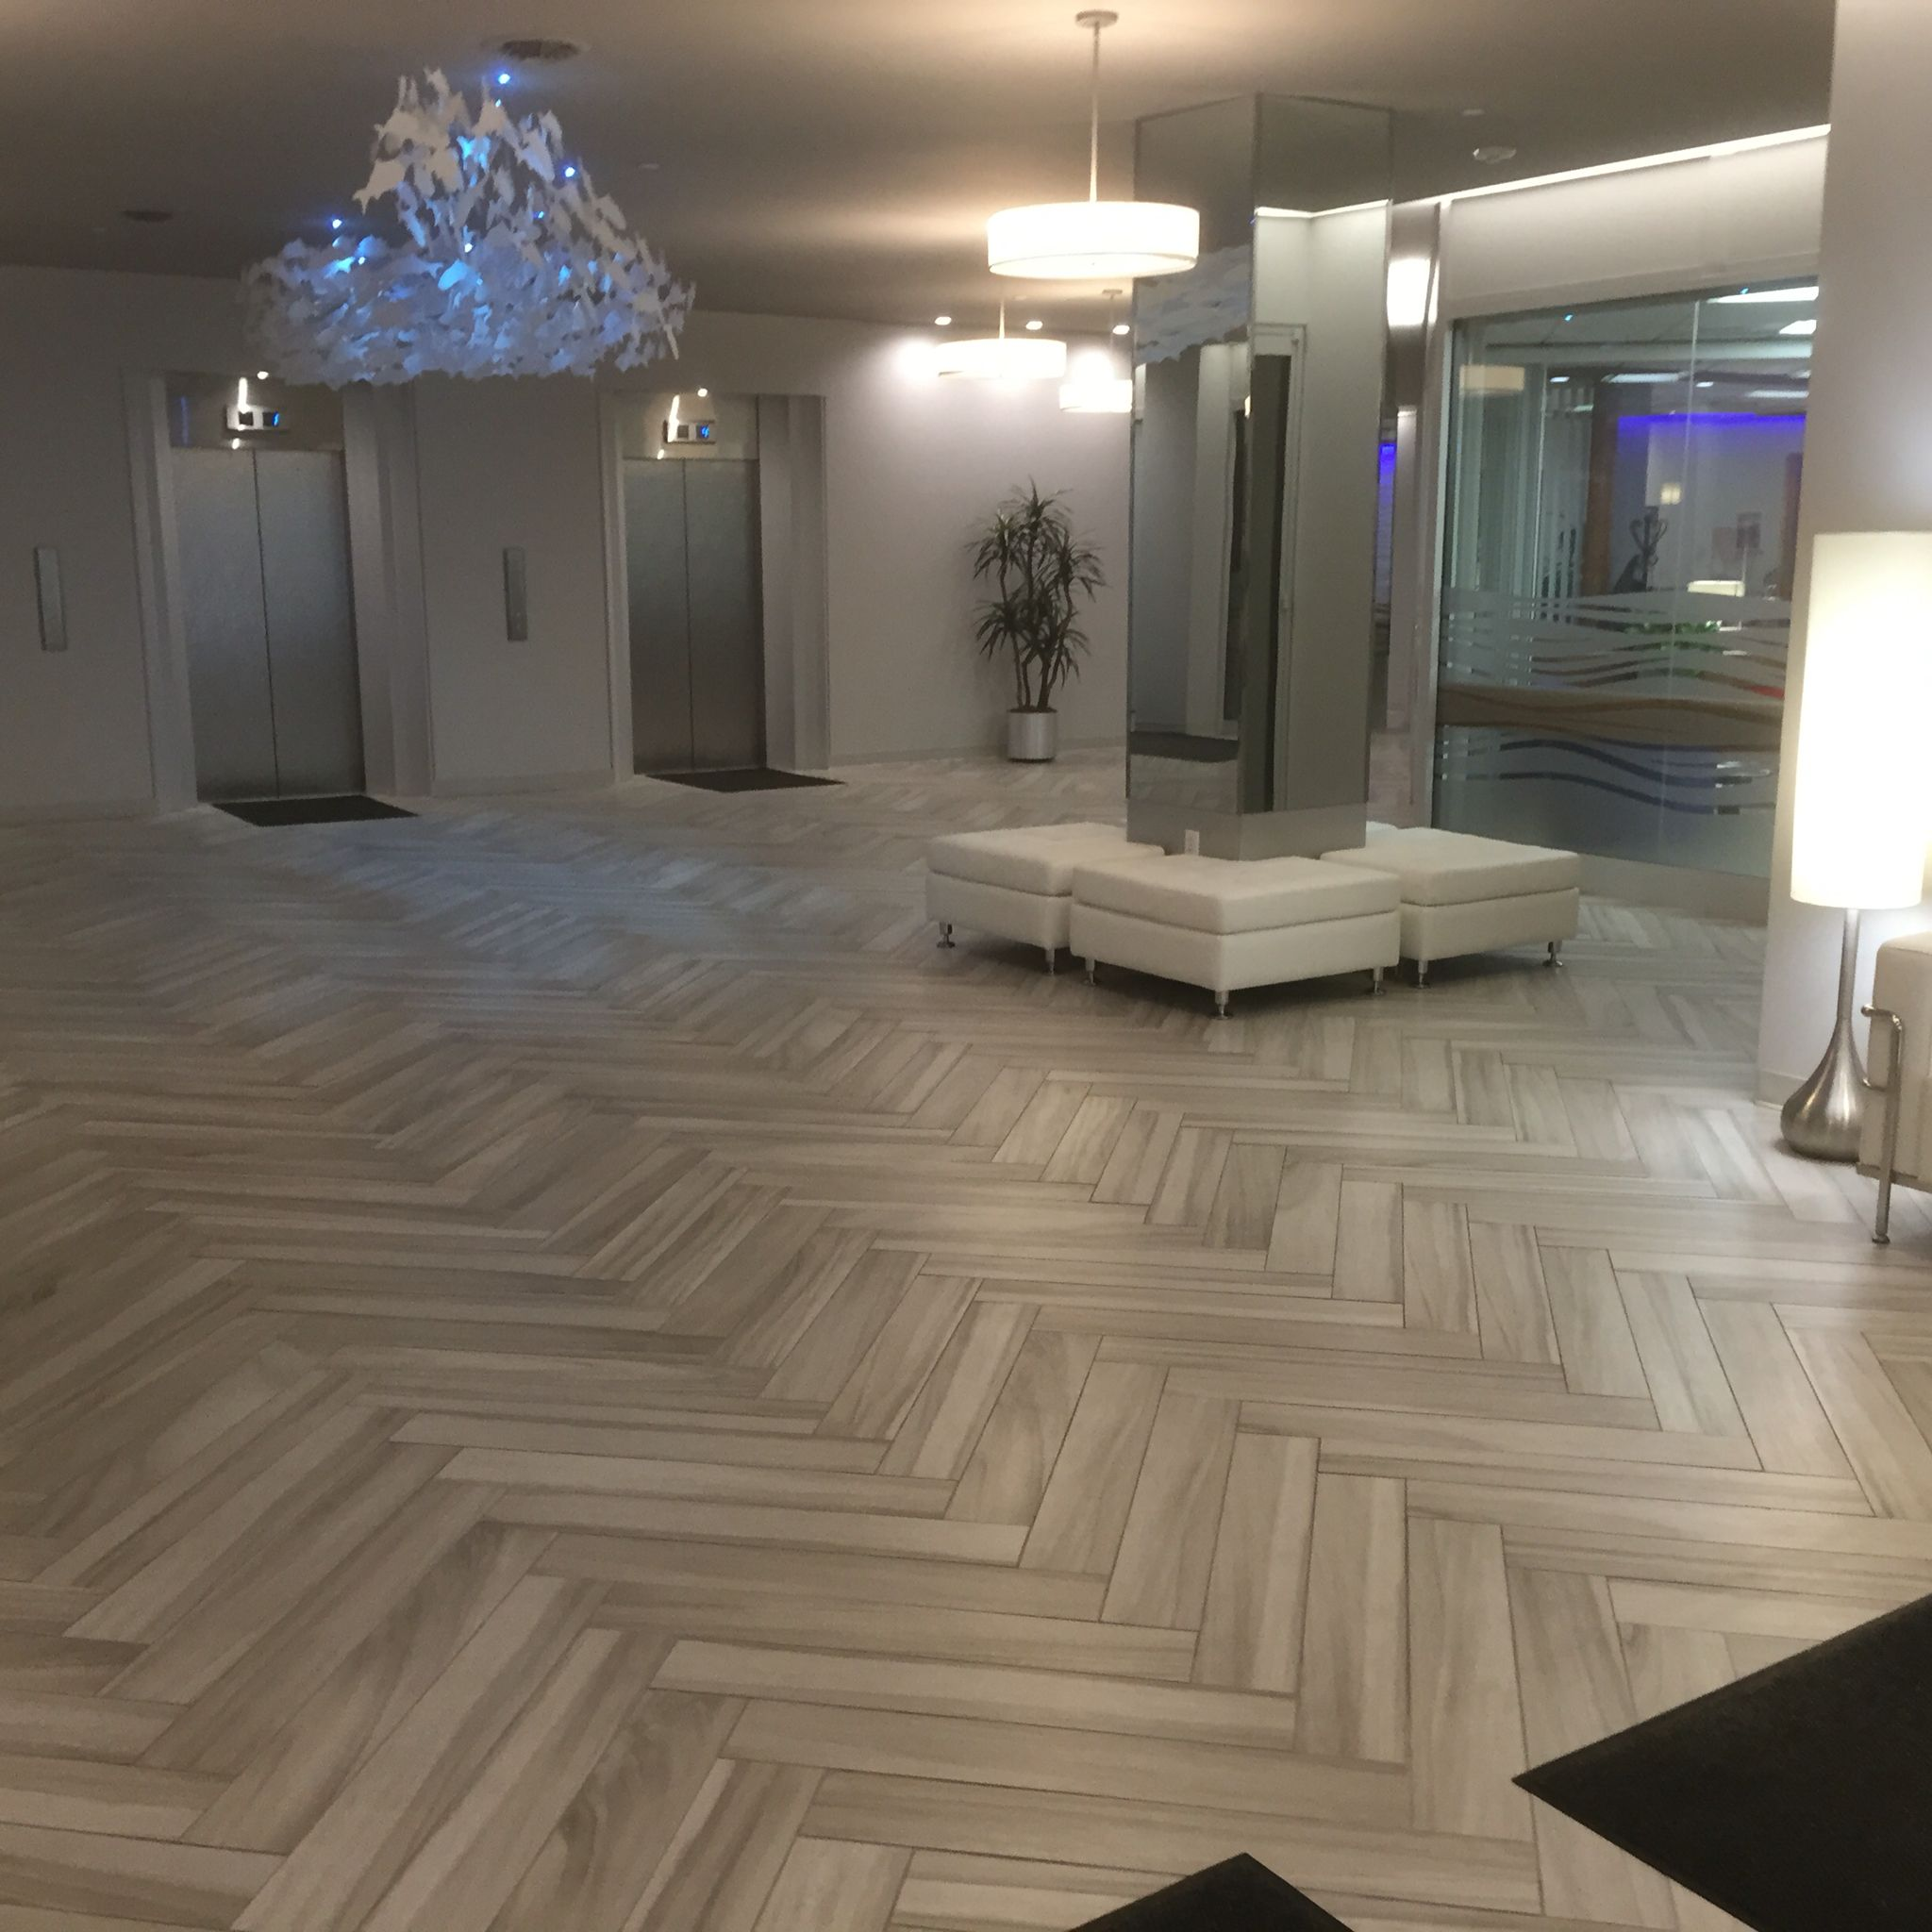 wood porcelain tile. daltile acacia valley color av05 ash 6x36